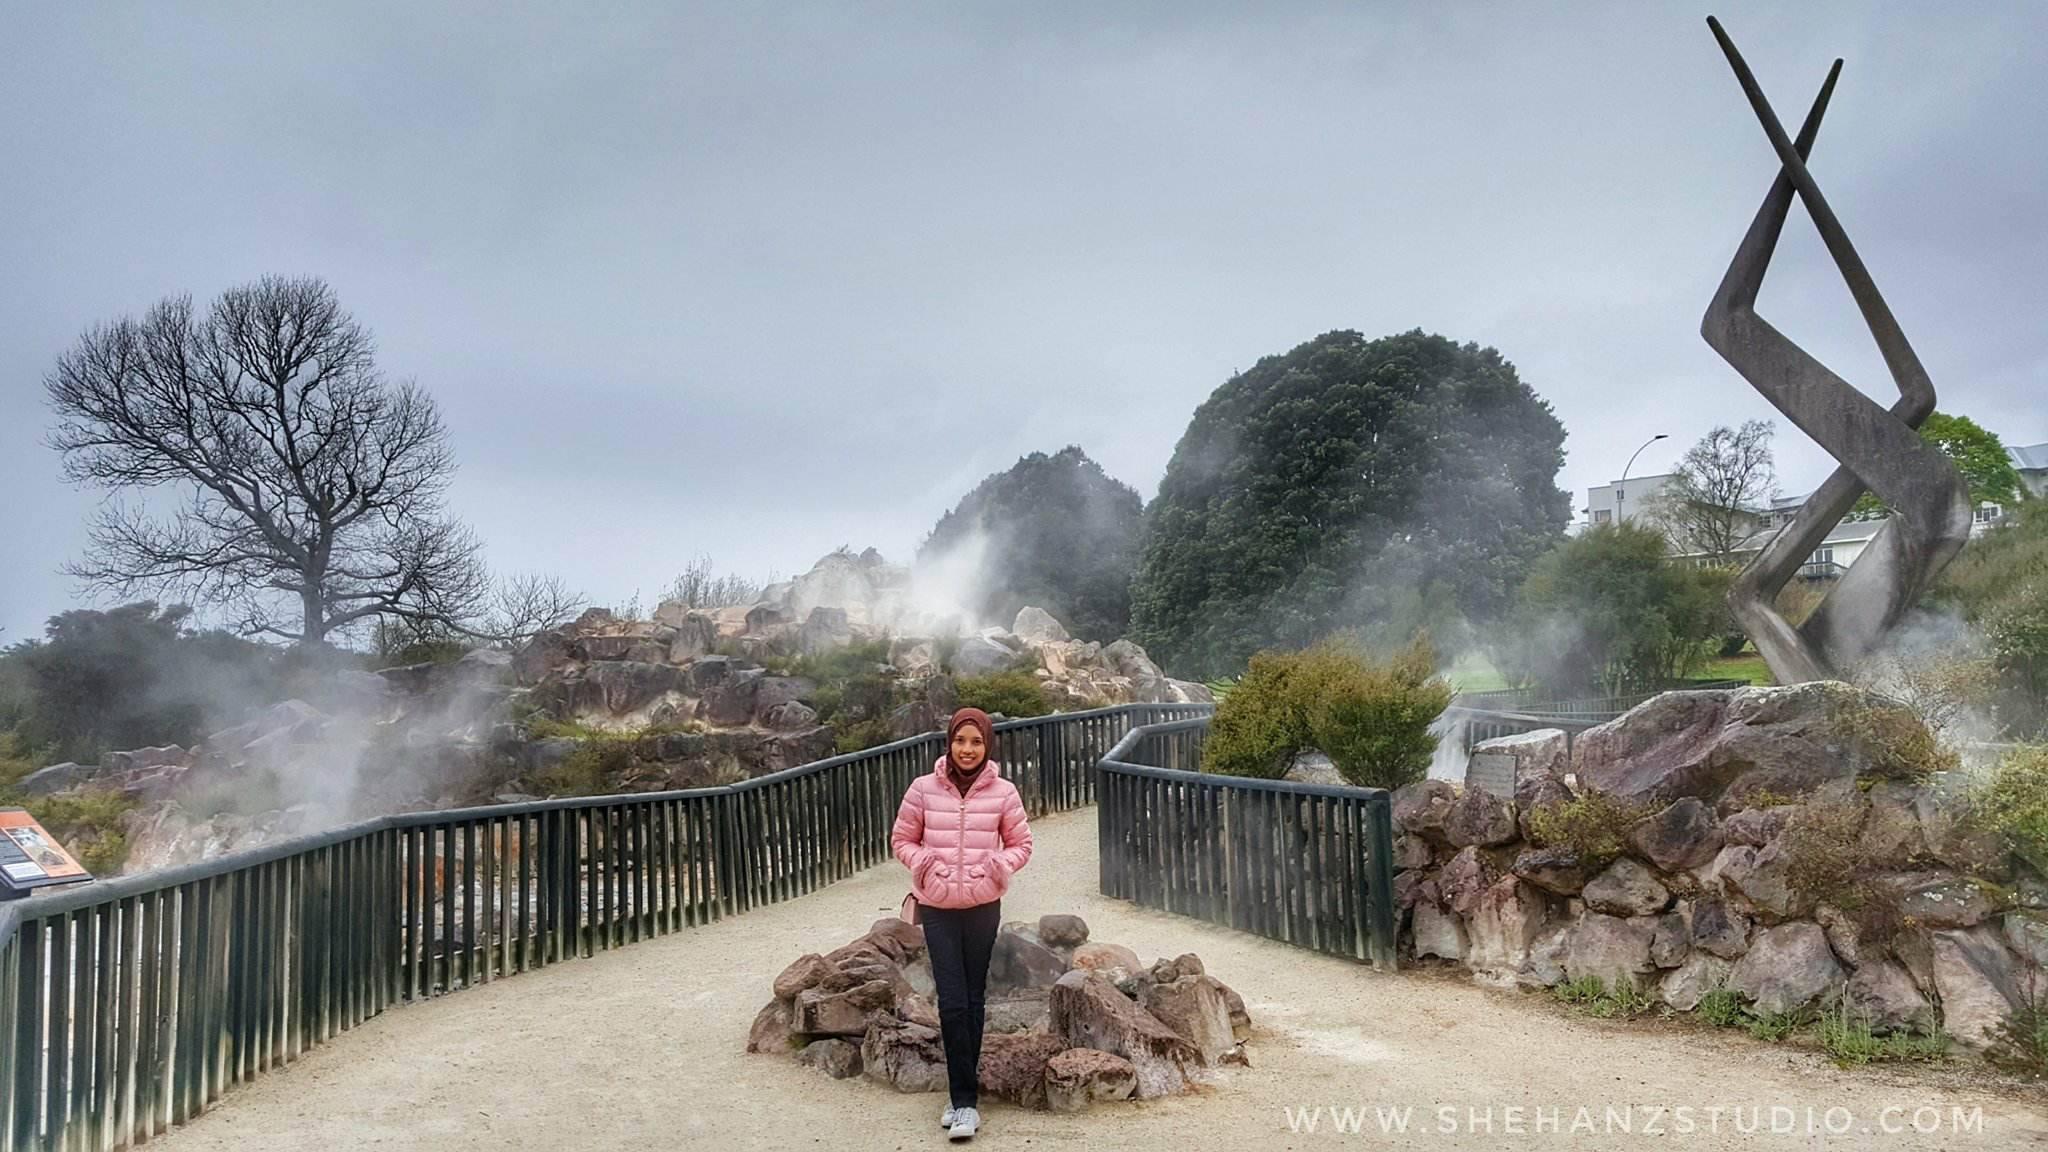 KEMBARA #KBBA9 COSMODERM - IKHLAS TOURS KE NEW ZEALAND BLUE LAKE, TARAWERA, AGRODOME AT ROTORUA (SPRING TIME) (PART 5) (7)